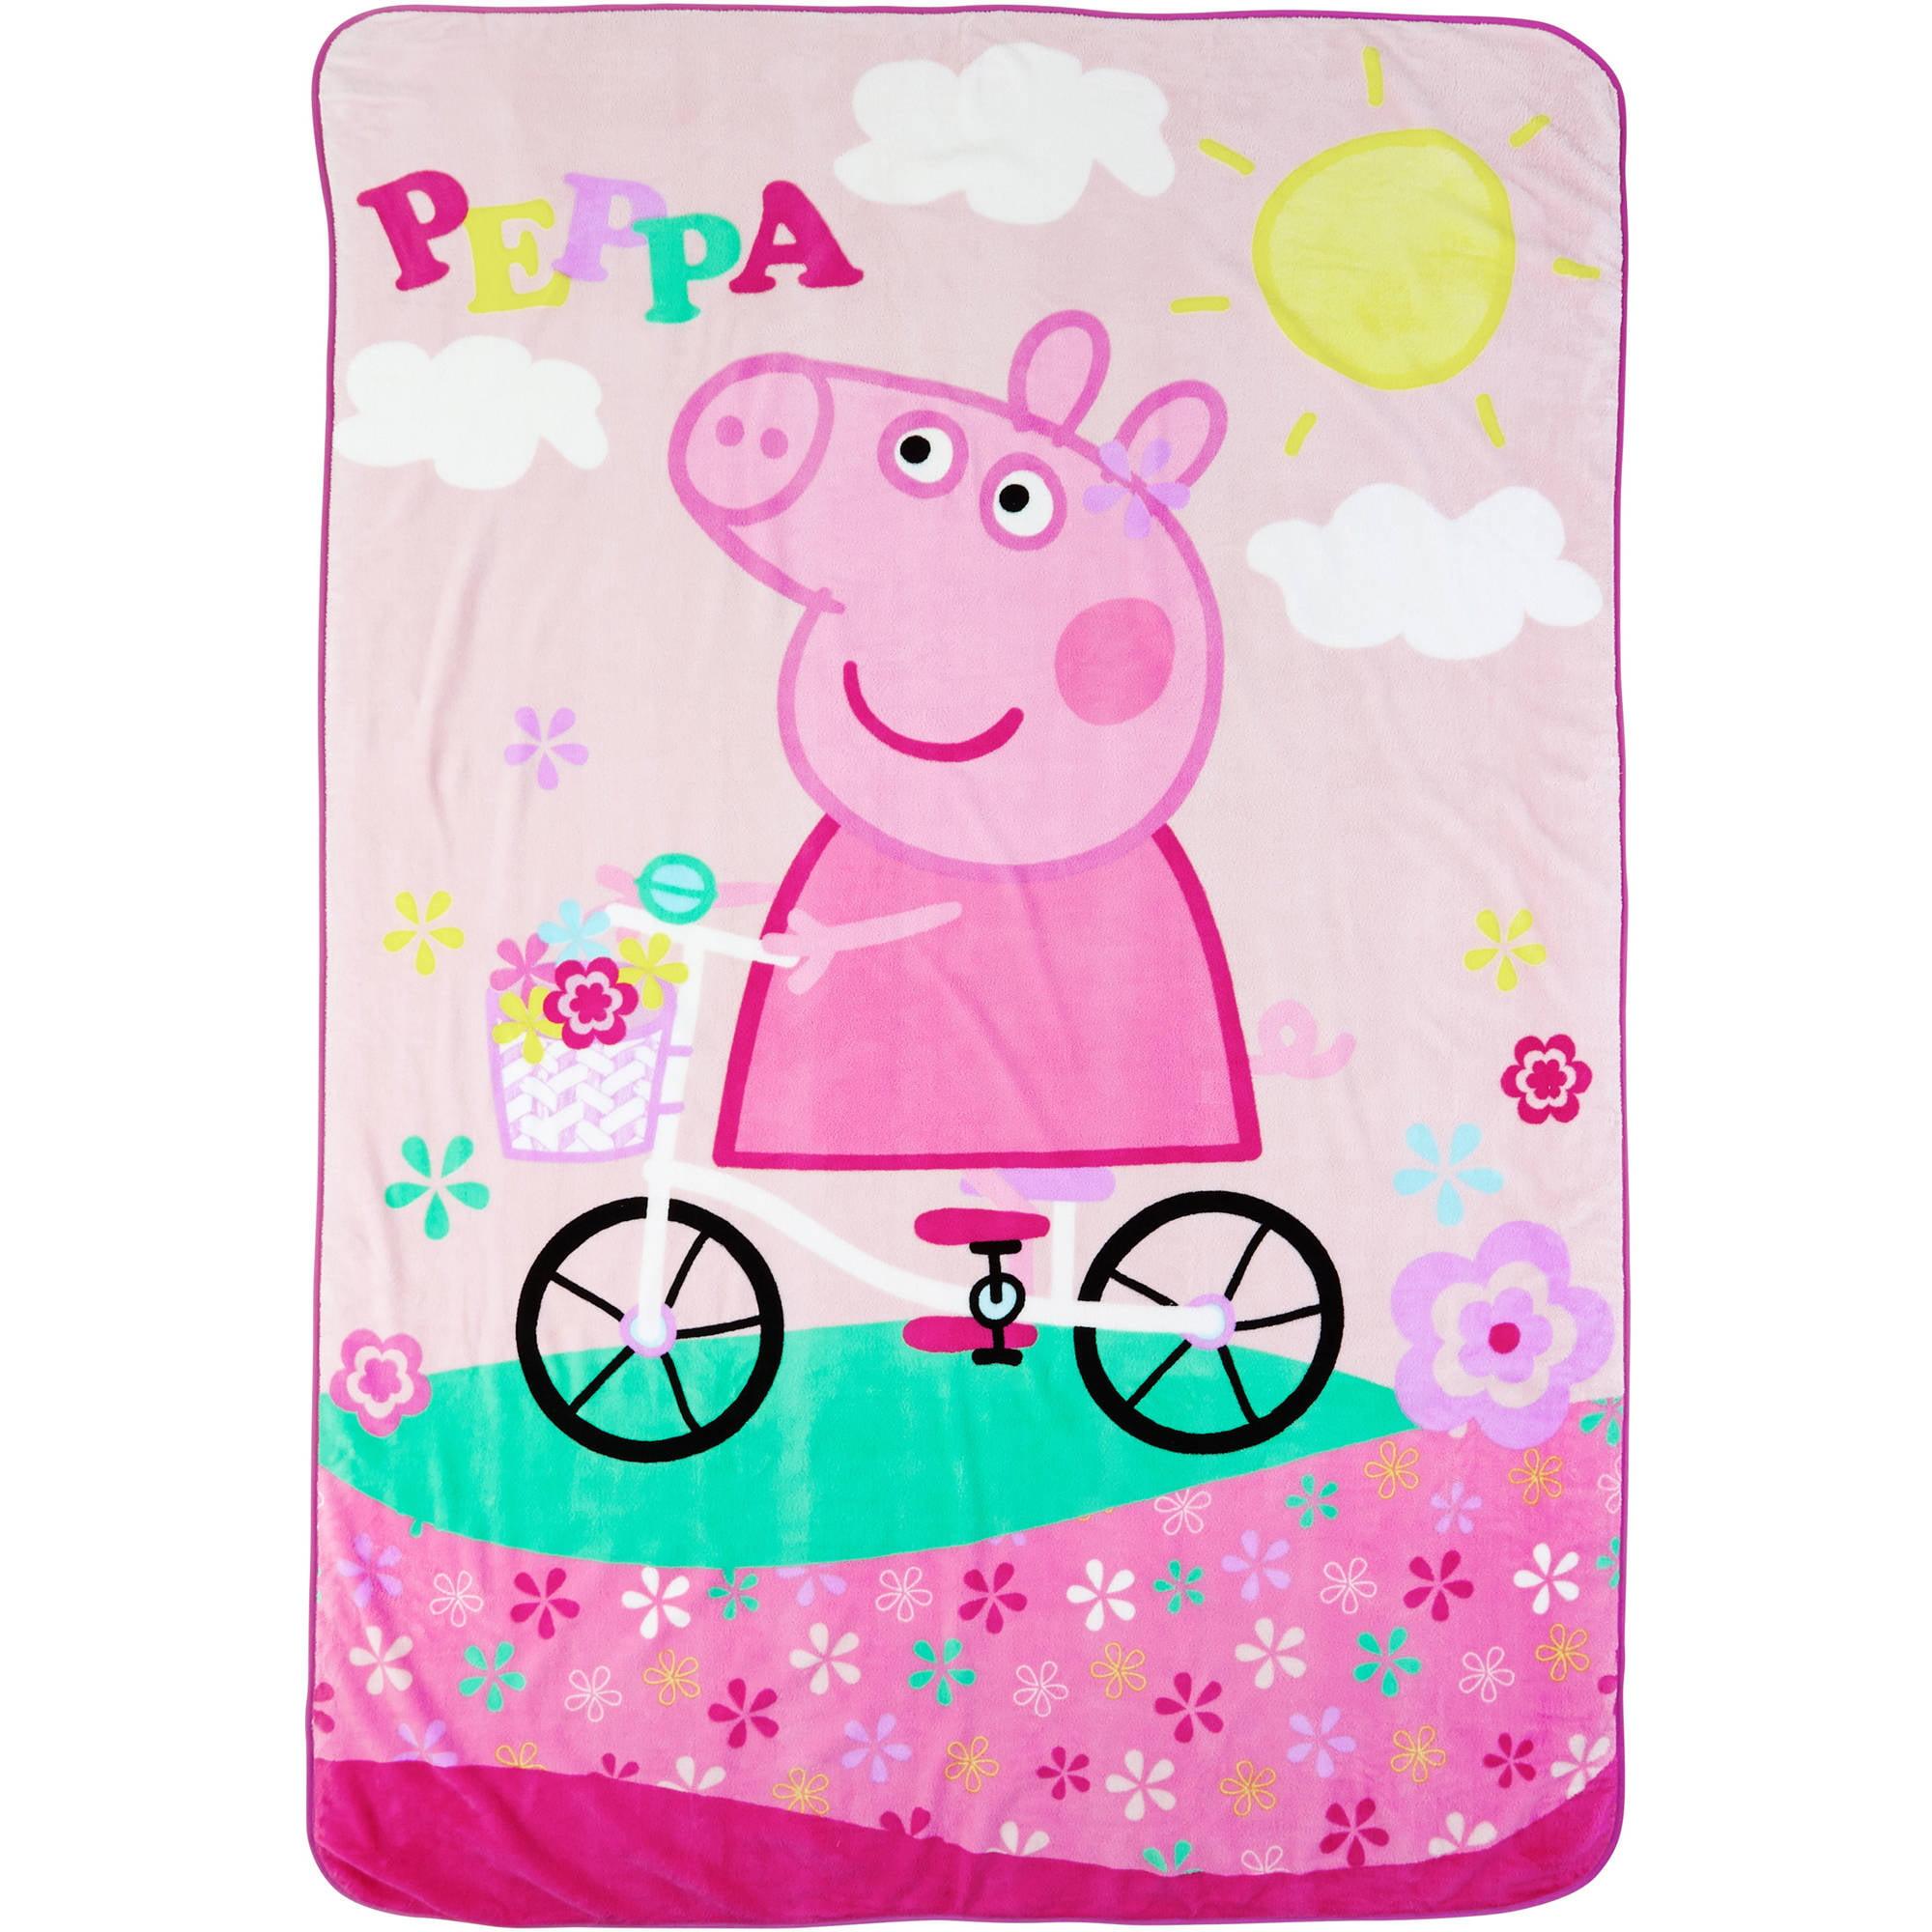 "Peppa Pig Bike Ride With Peppa 62"" x 90"" Kids Plush Blanket by Generic"